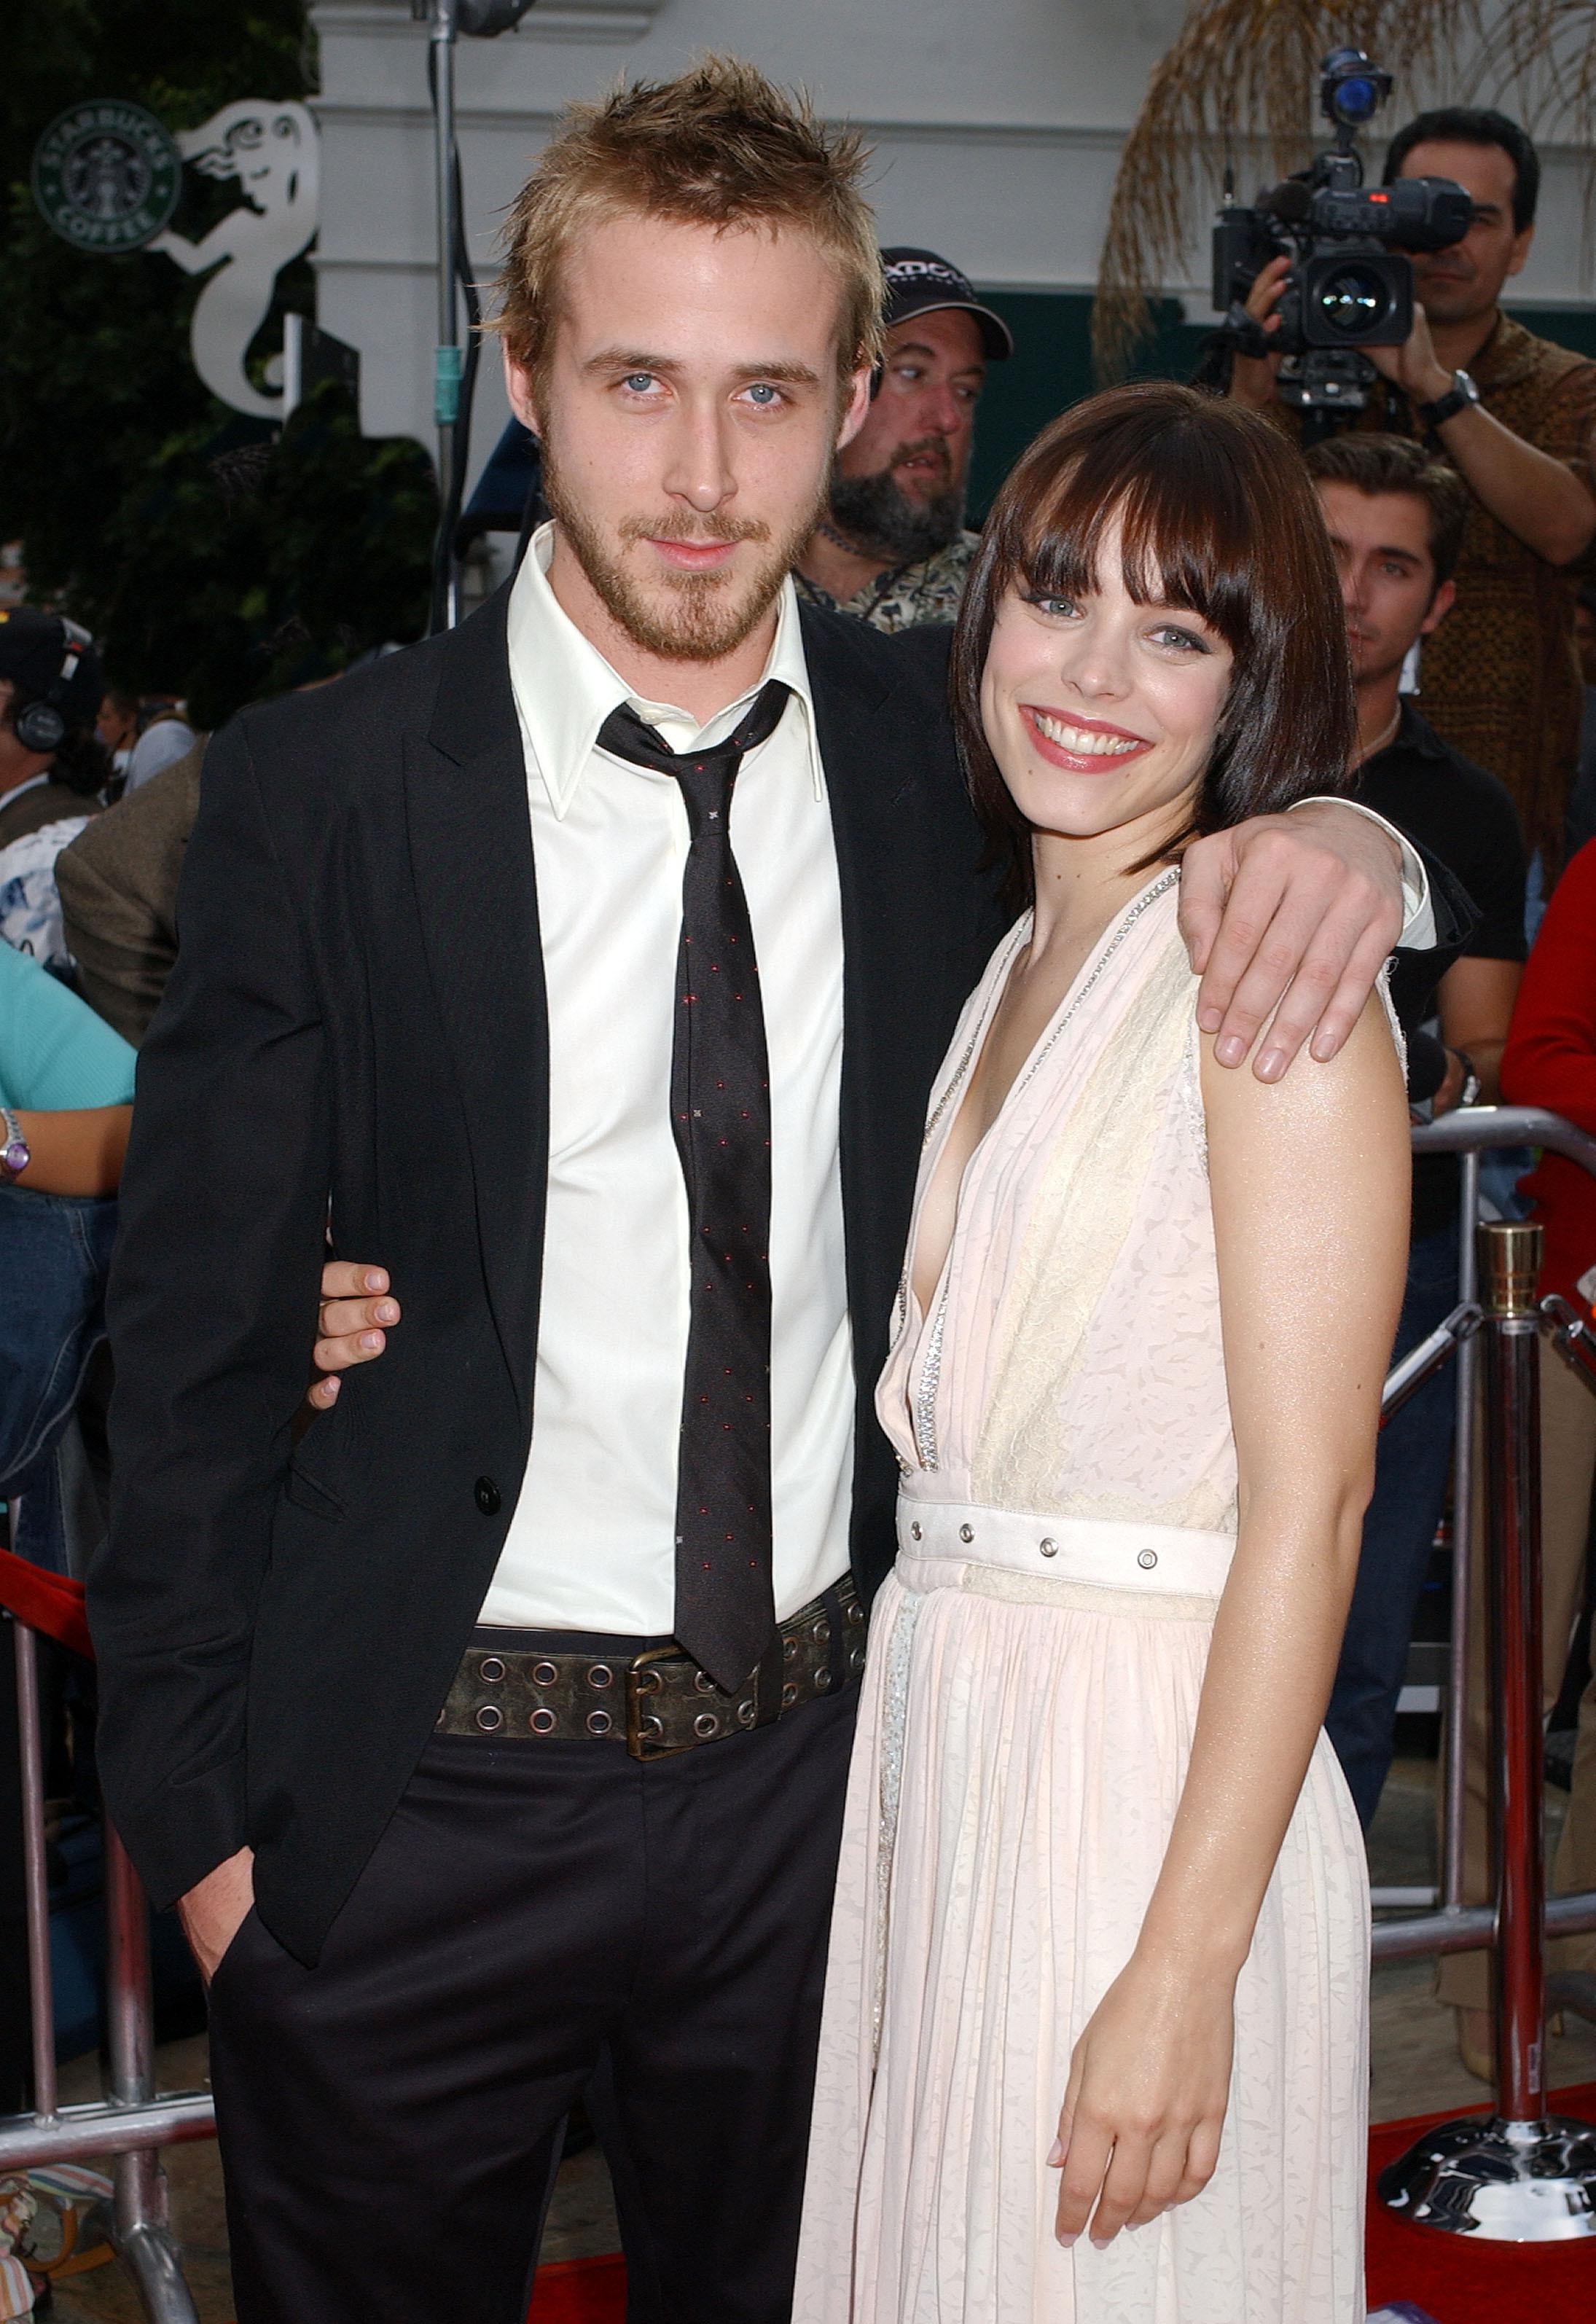 Ryan Gosling Rachel McAdams dated - Forgotten celeb